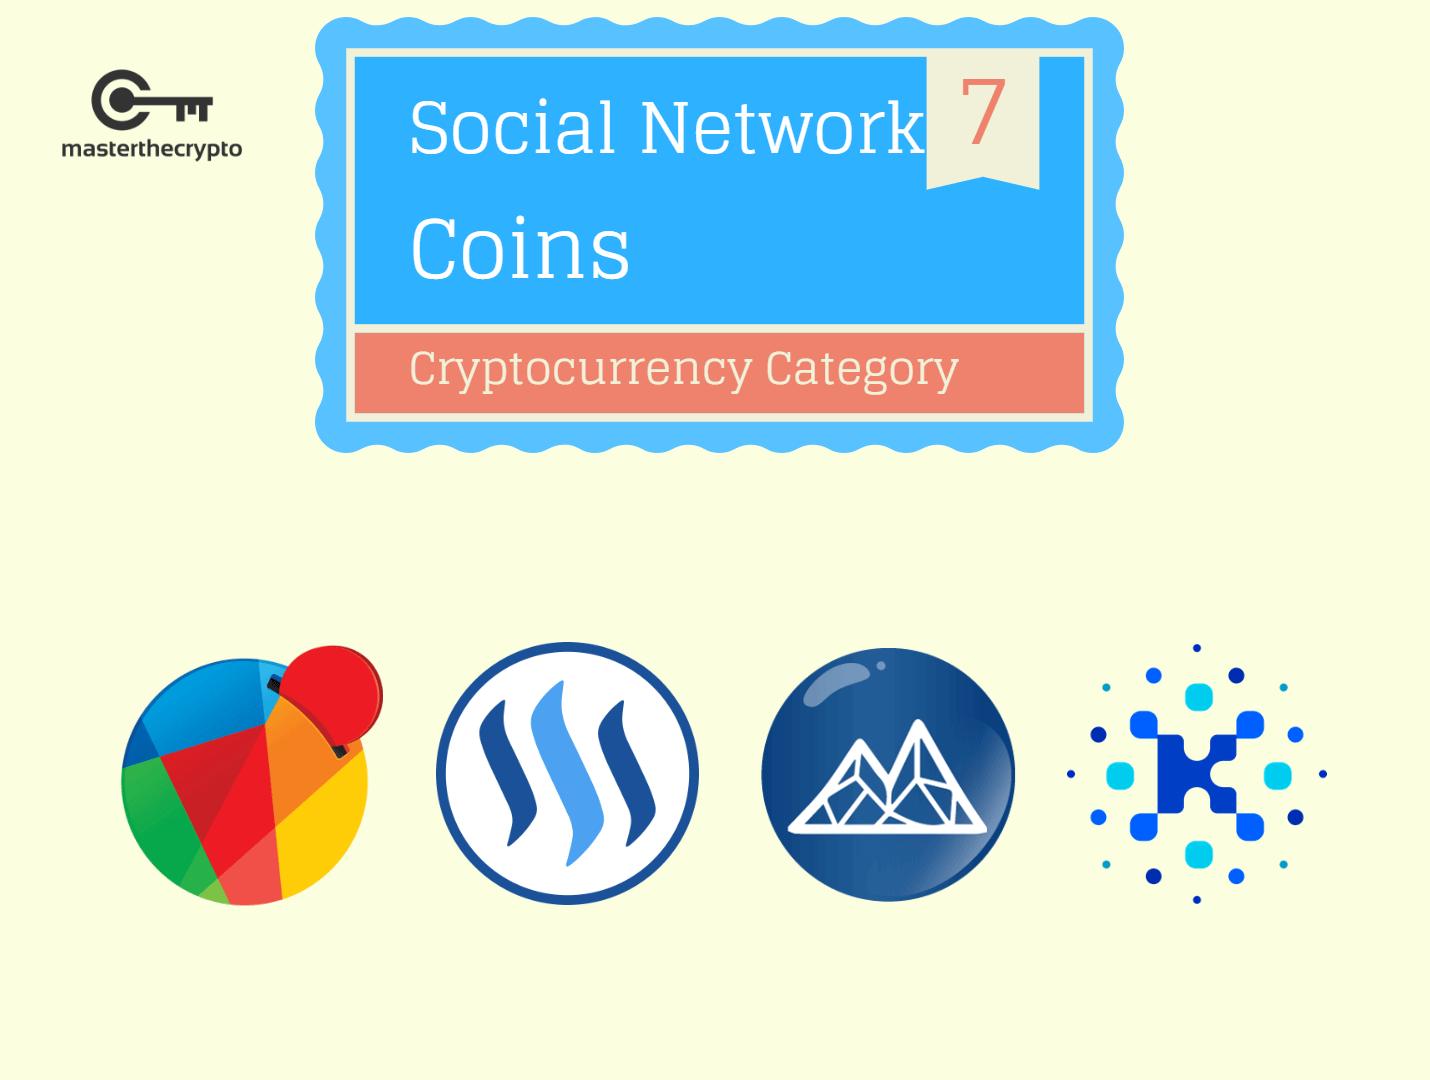 Social, social network, social network coins, network coins, social coins